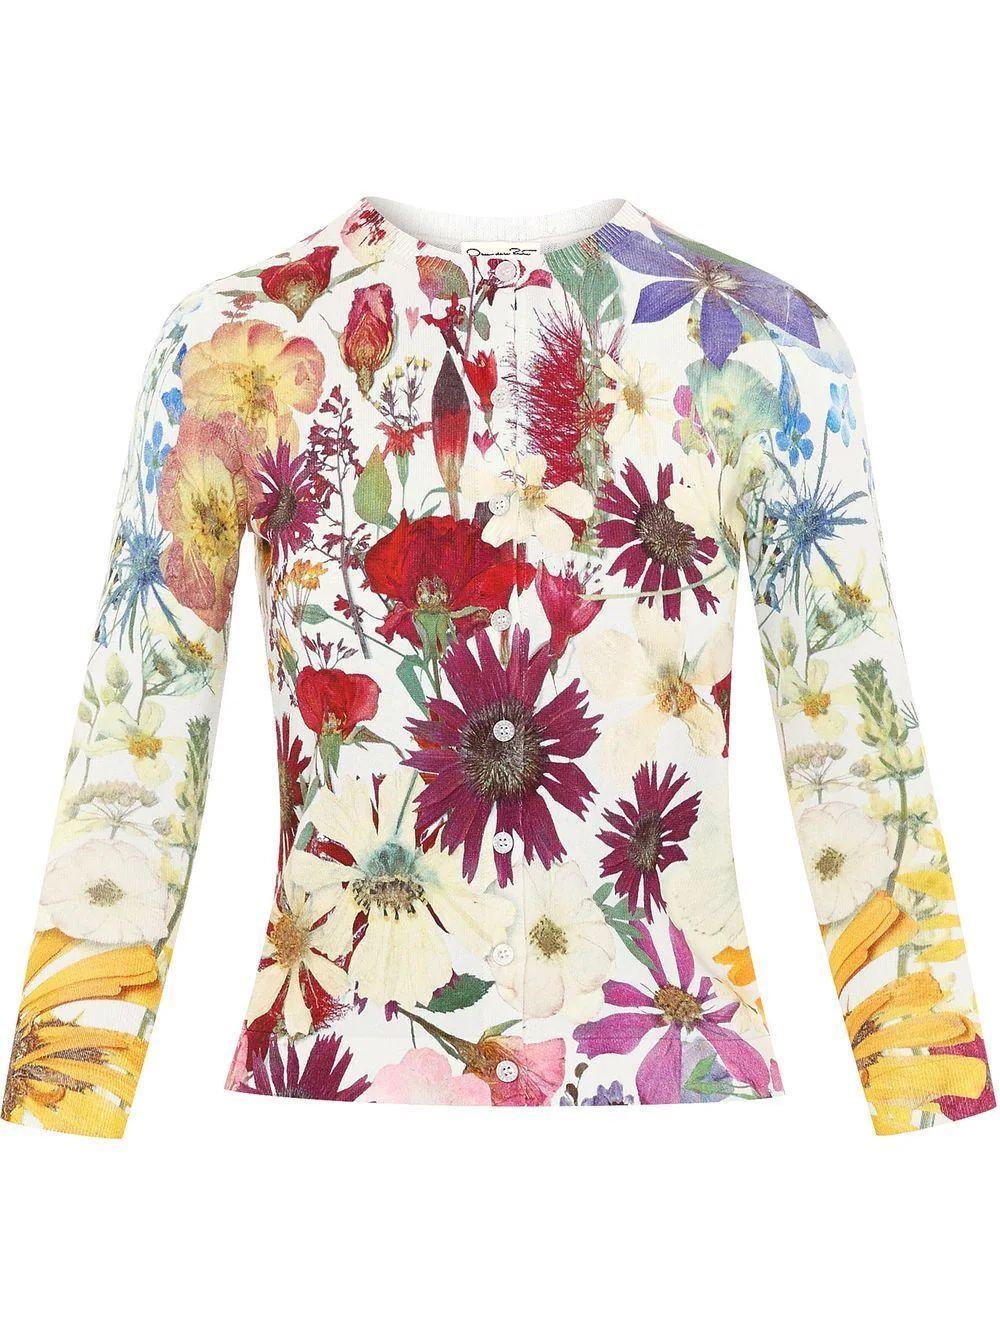 Pressed Flower Cardigan Item # 21FN125RBP